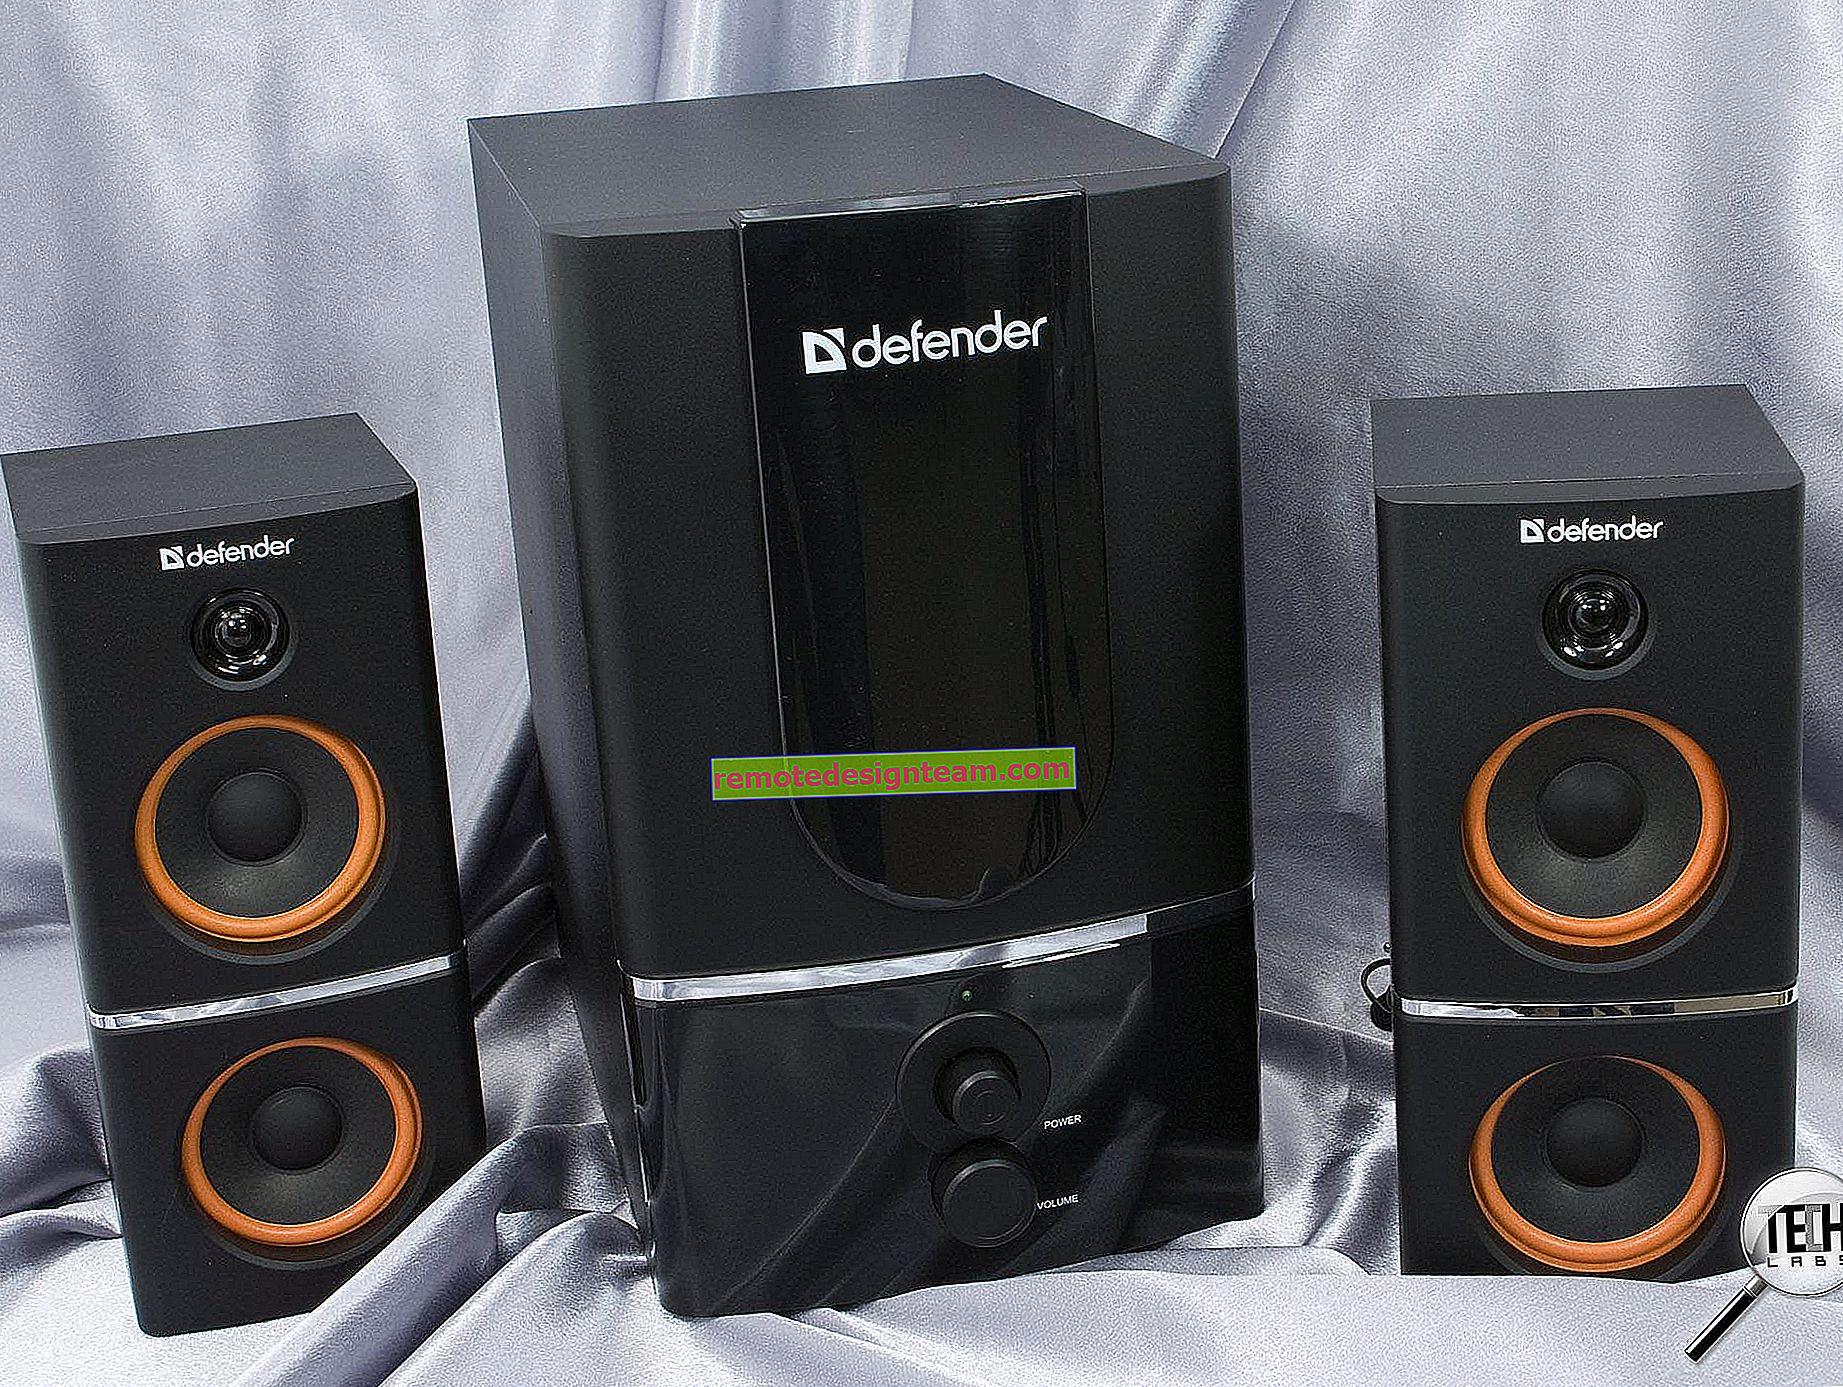 Penyesuai Bluetooth untuk komputer. Bagaimana memilih?